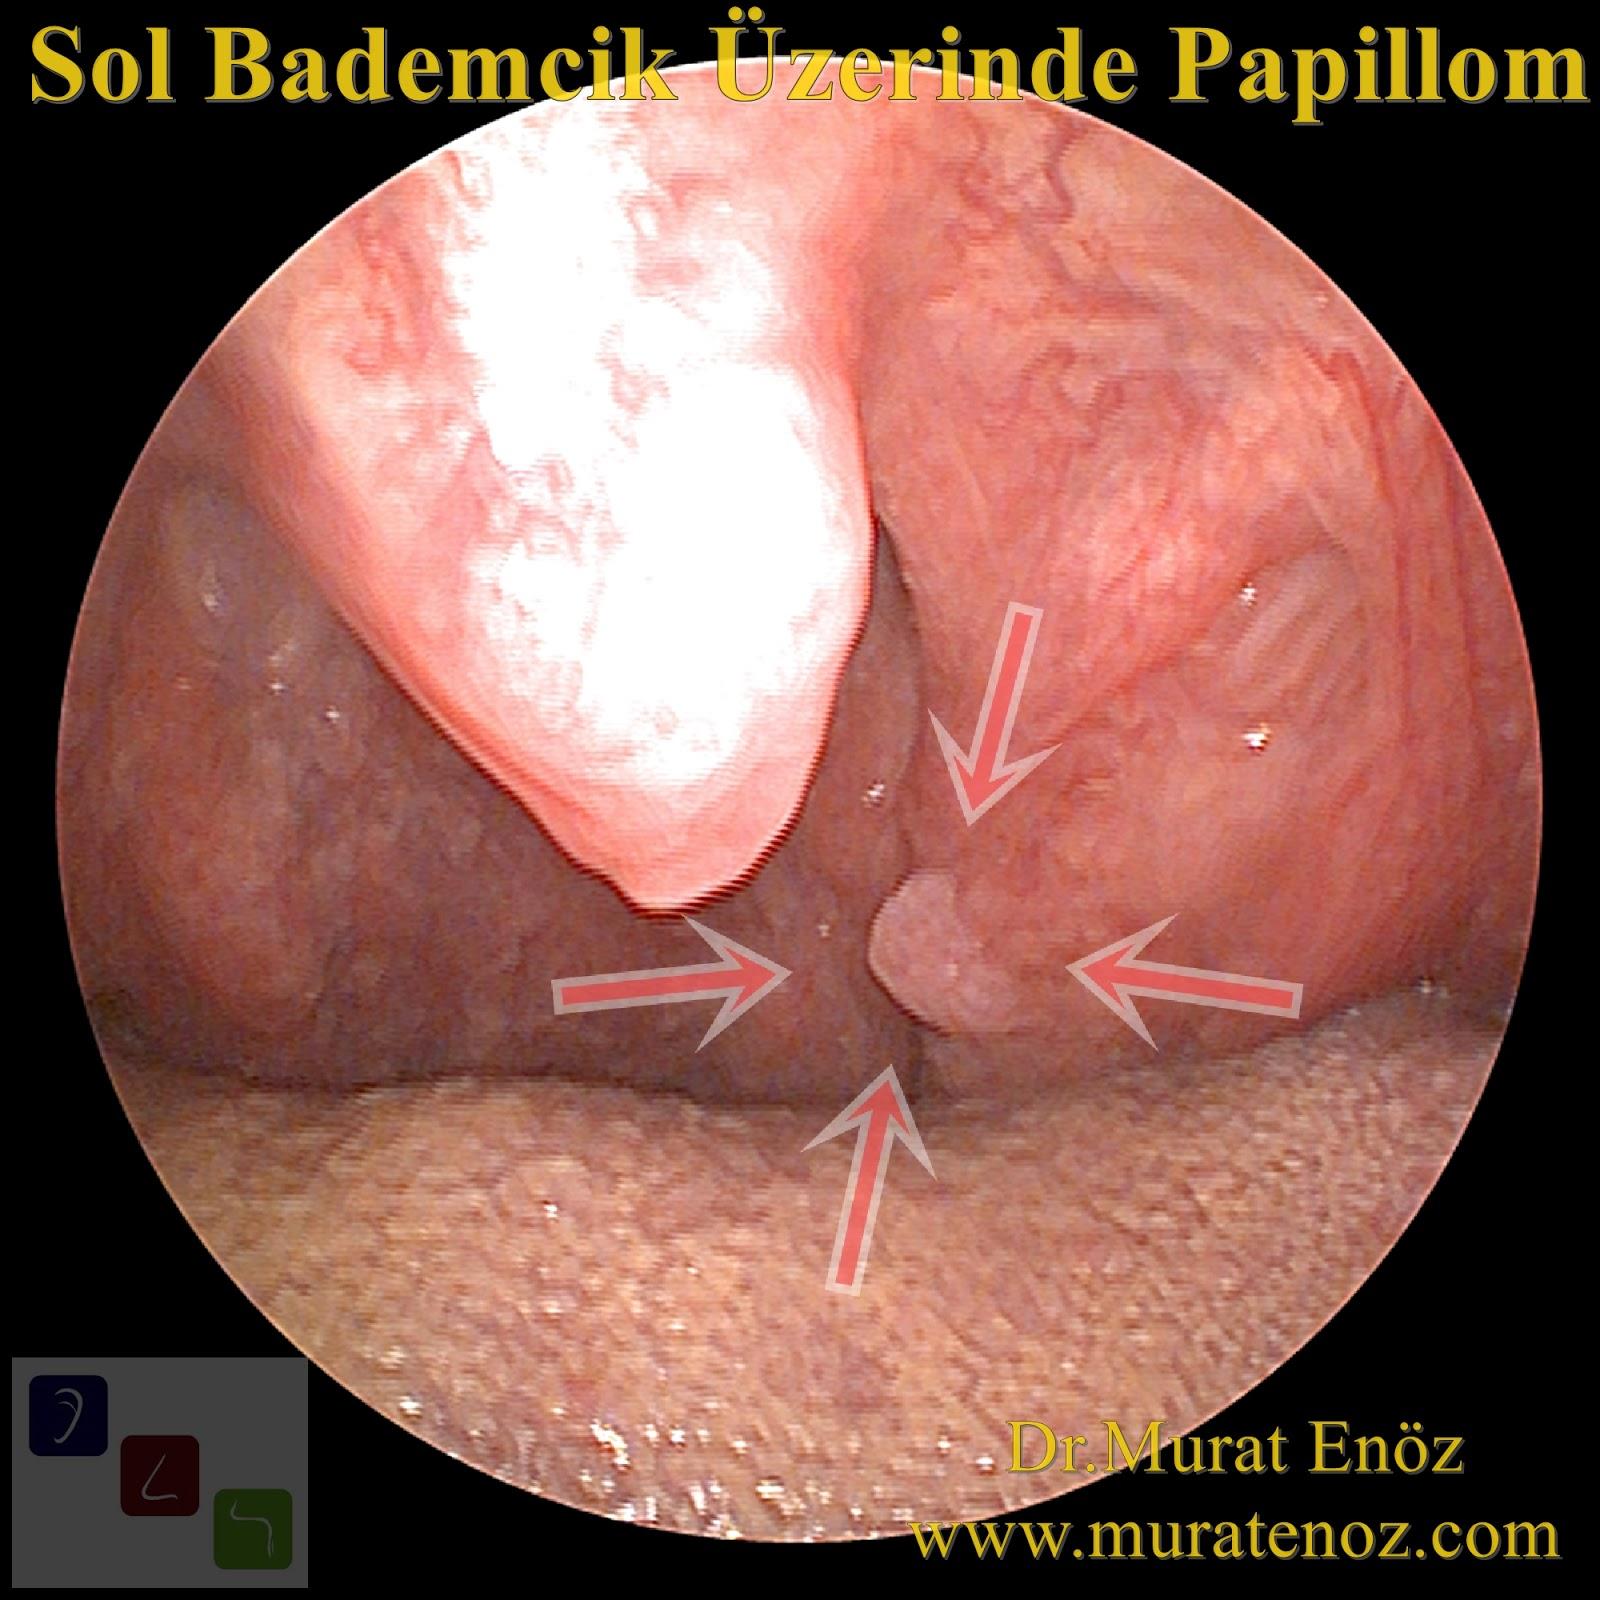 Human papilloma virus enfeksiyonu nedir